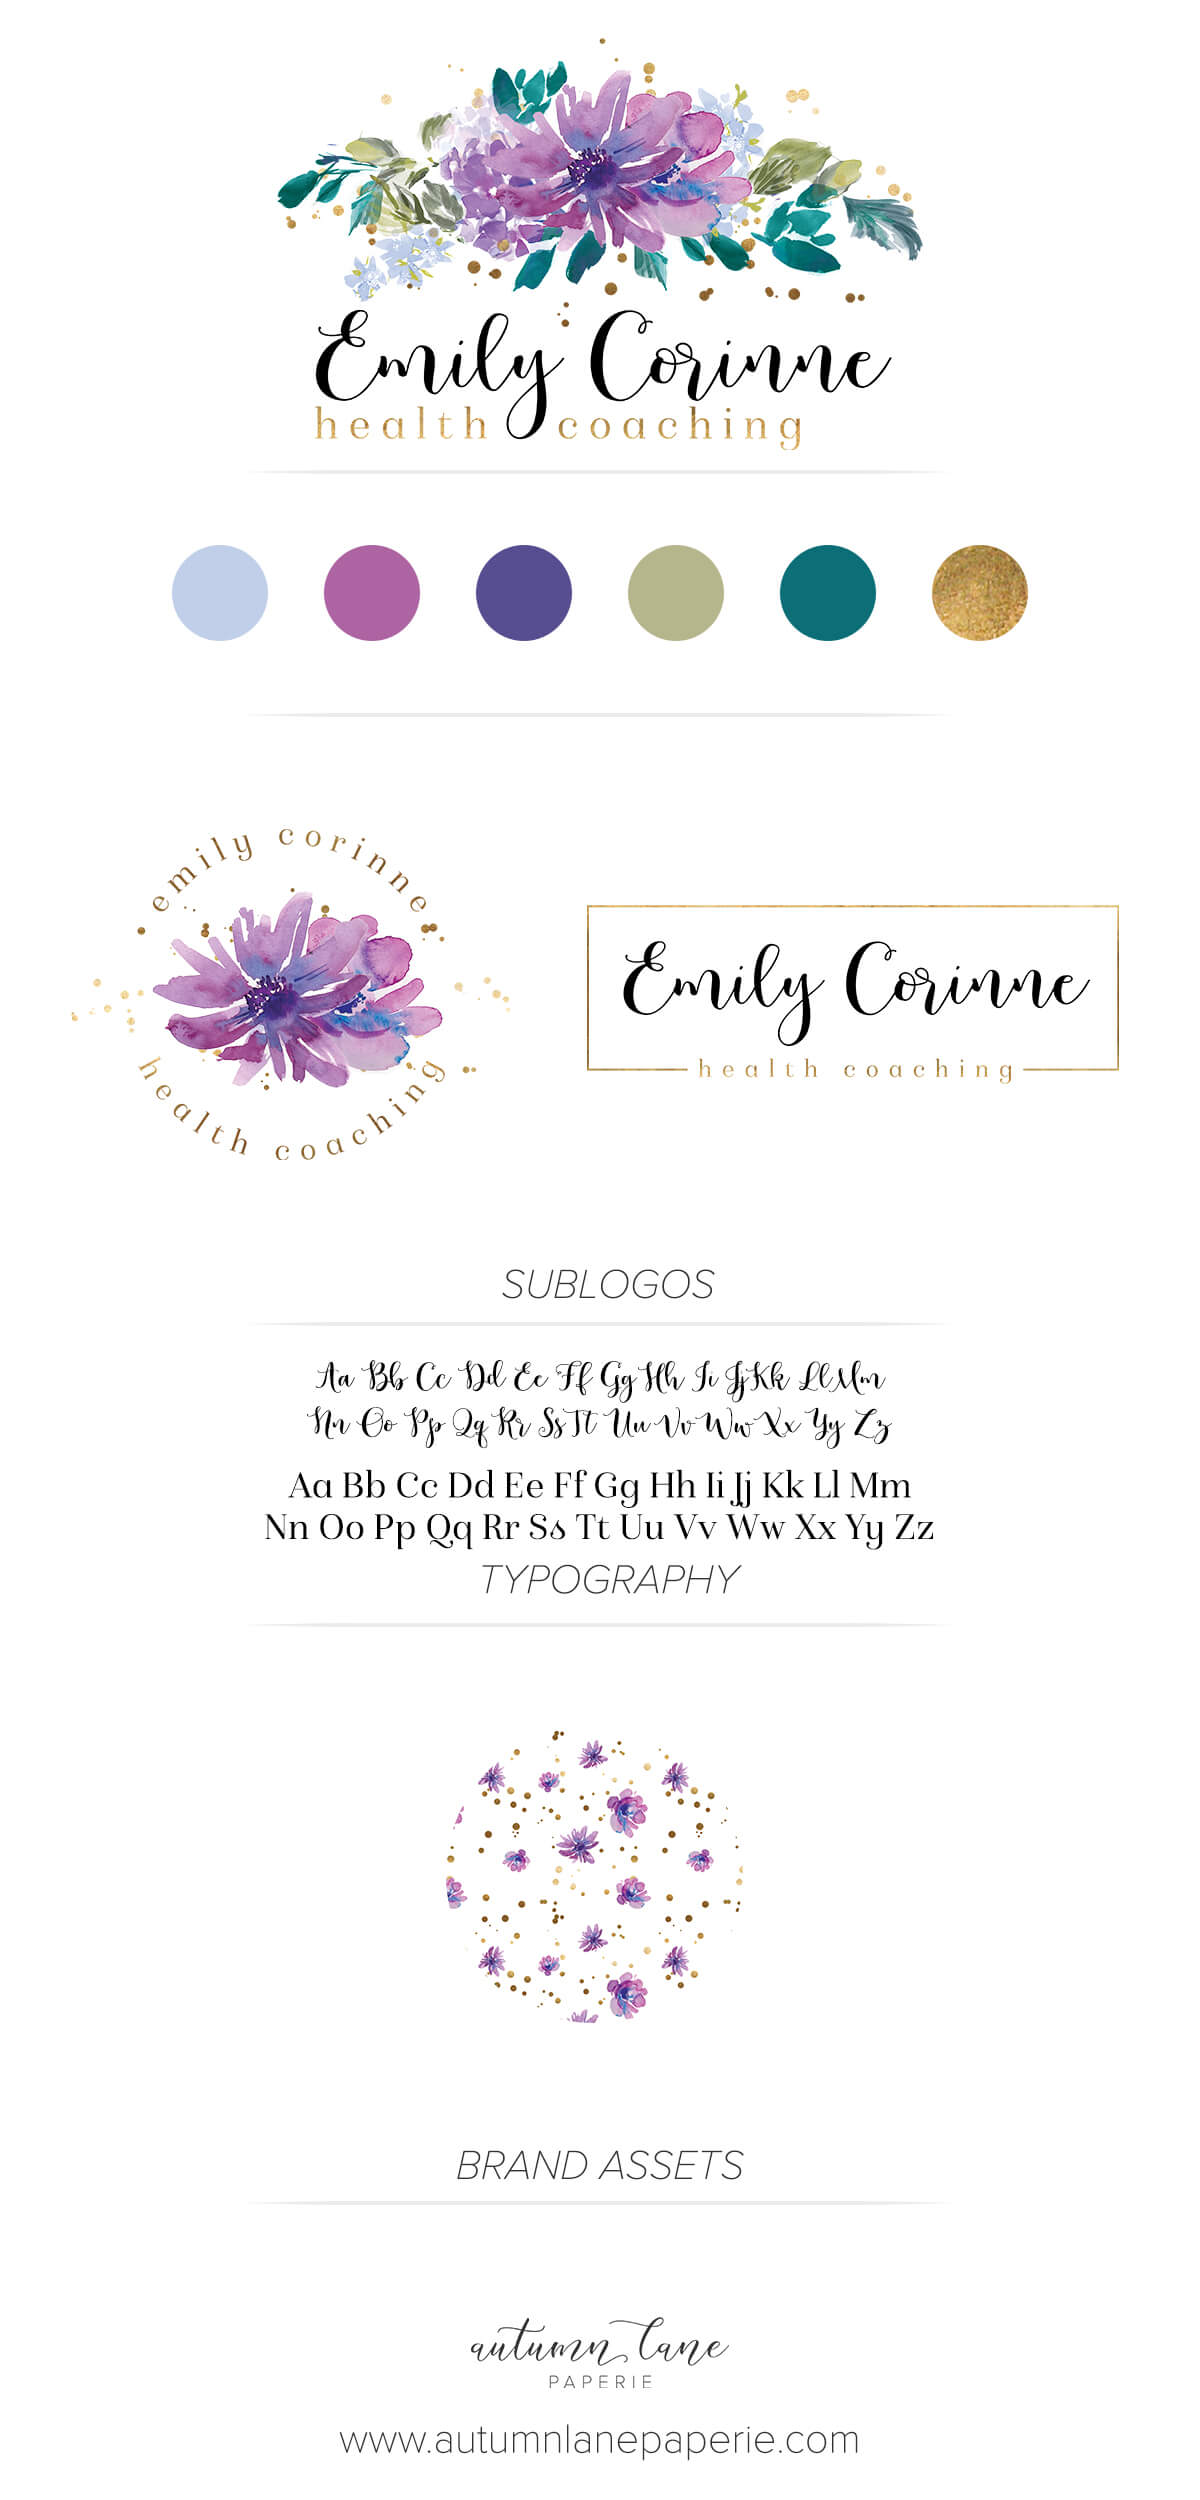 Brand Brag: Emily Corinne Health Coaching